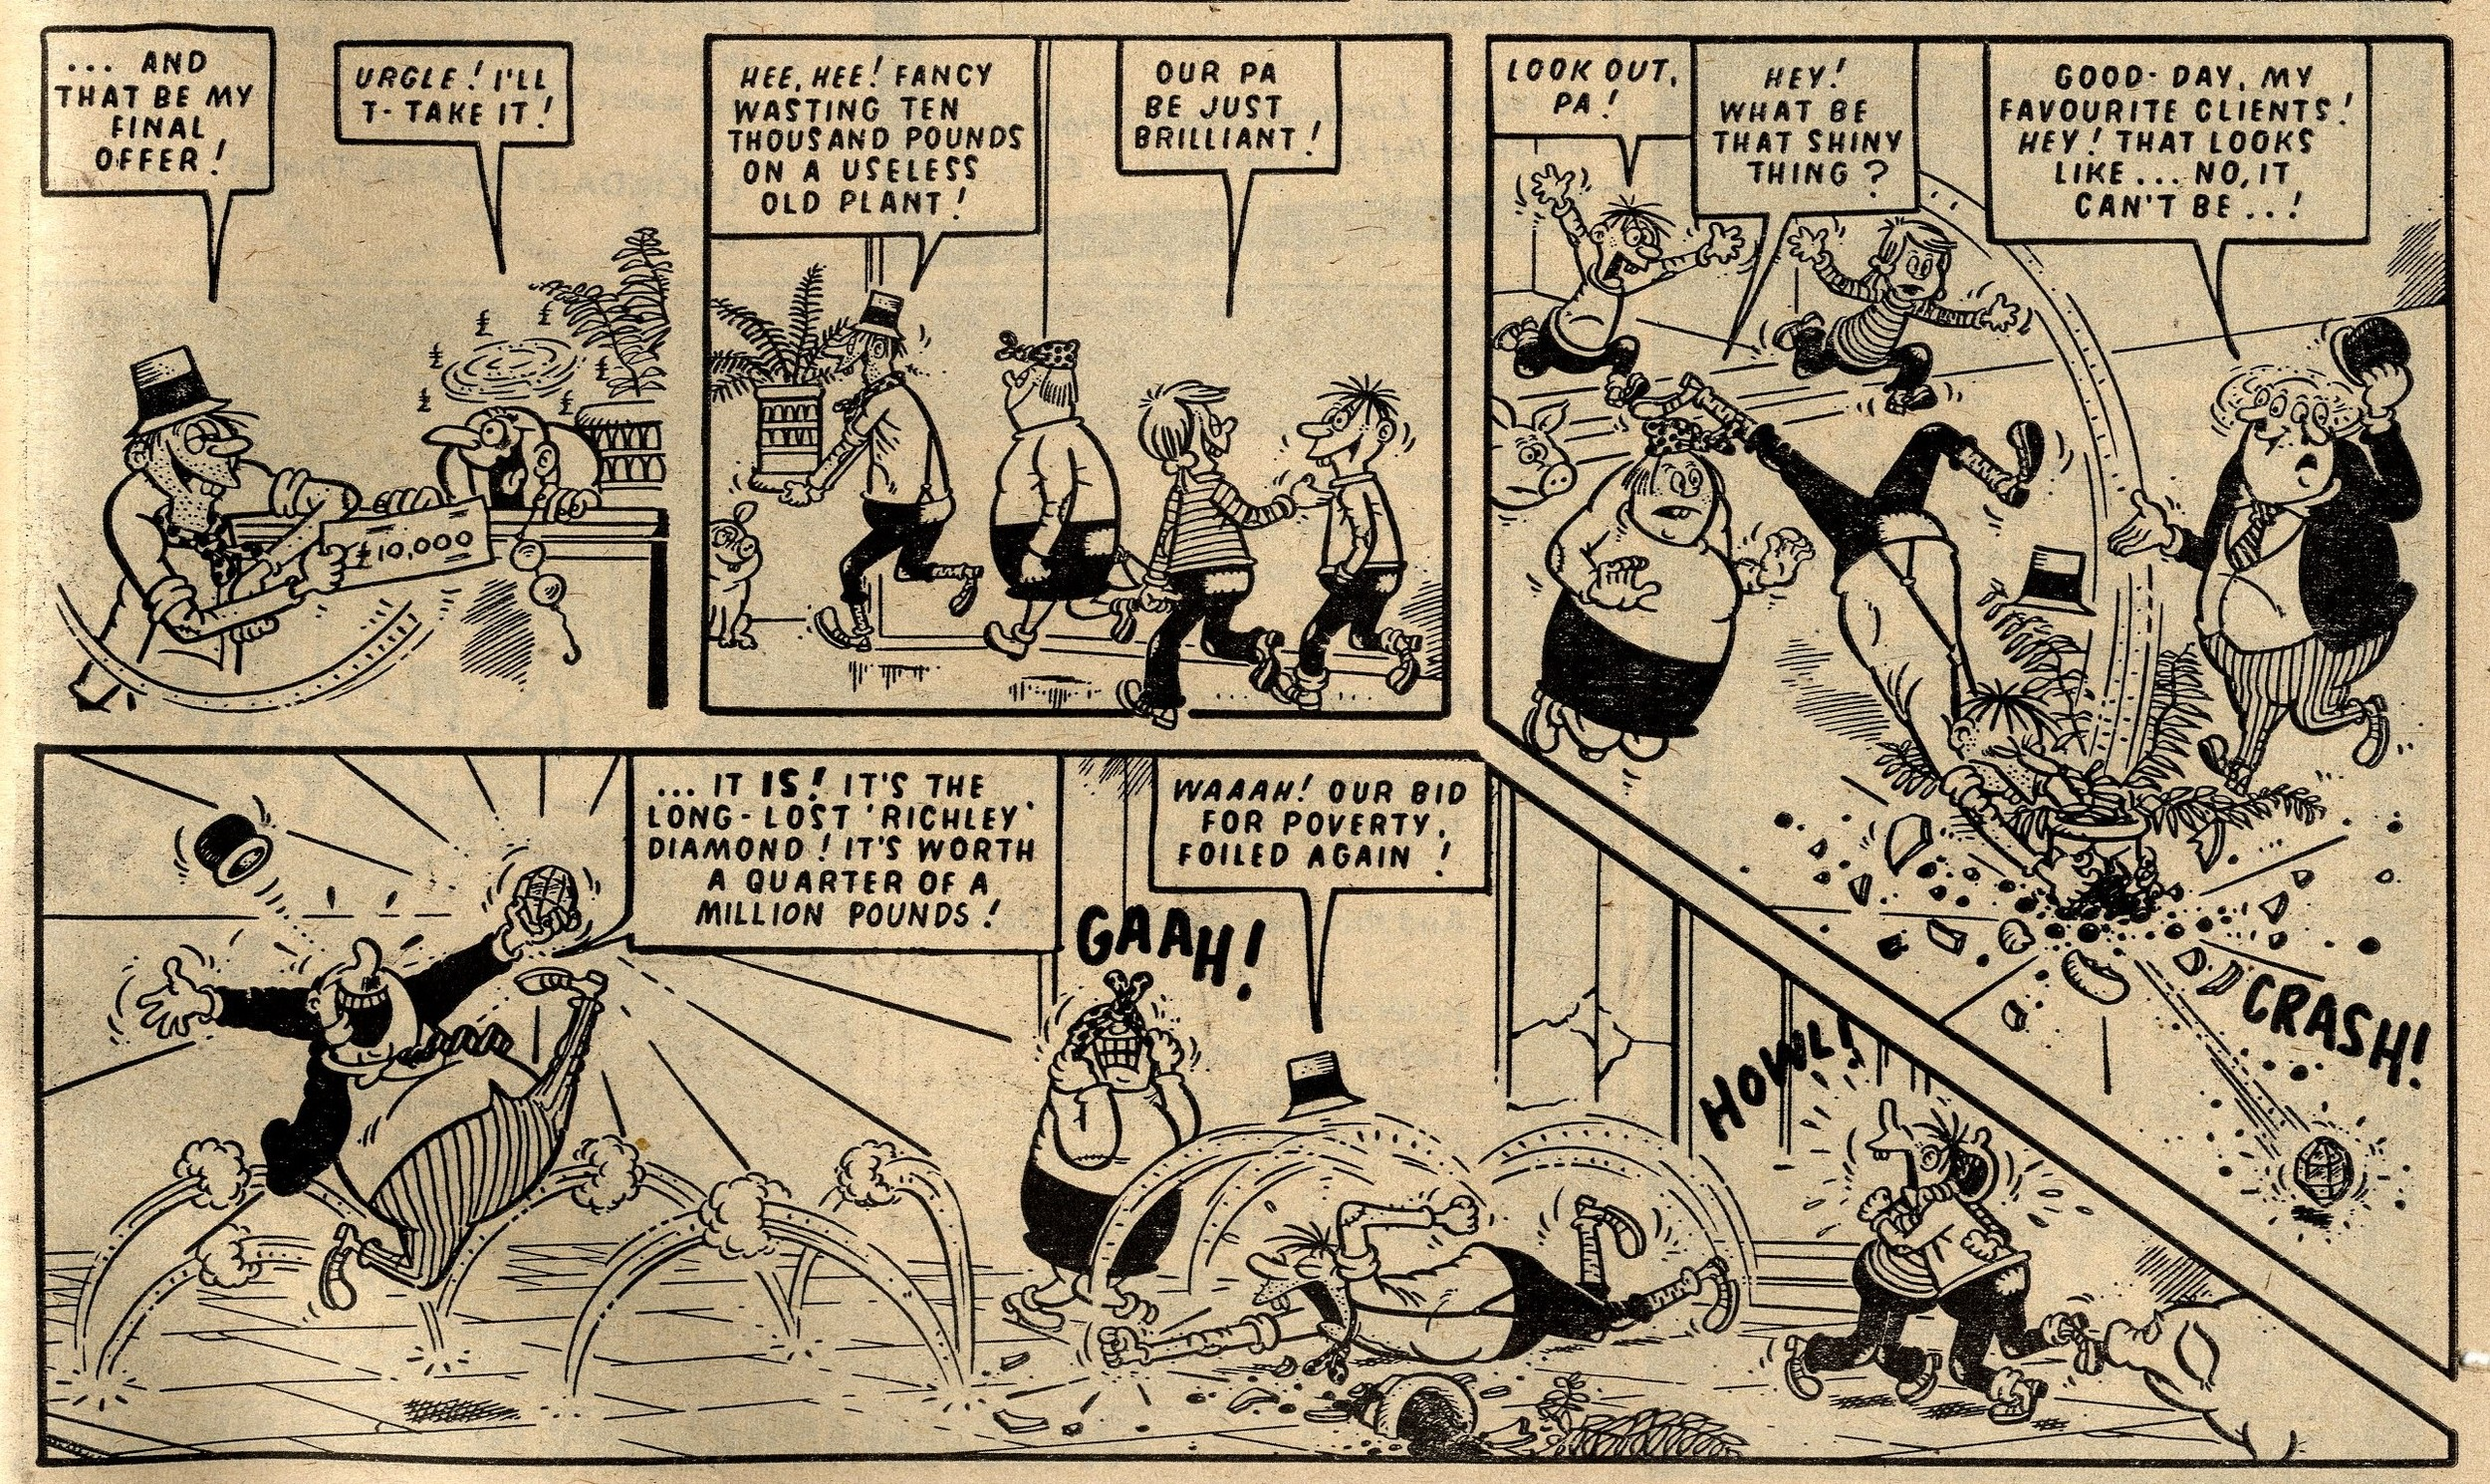 The Bumpkin Billionaires: Mike Lacey? Jimmy Hansen? (artist)